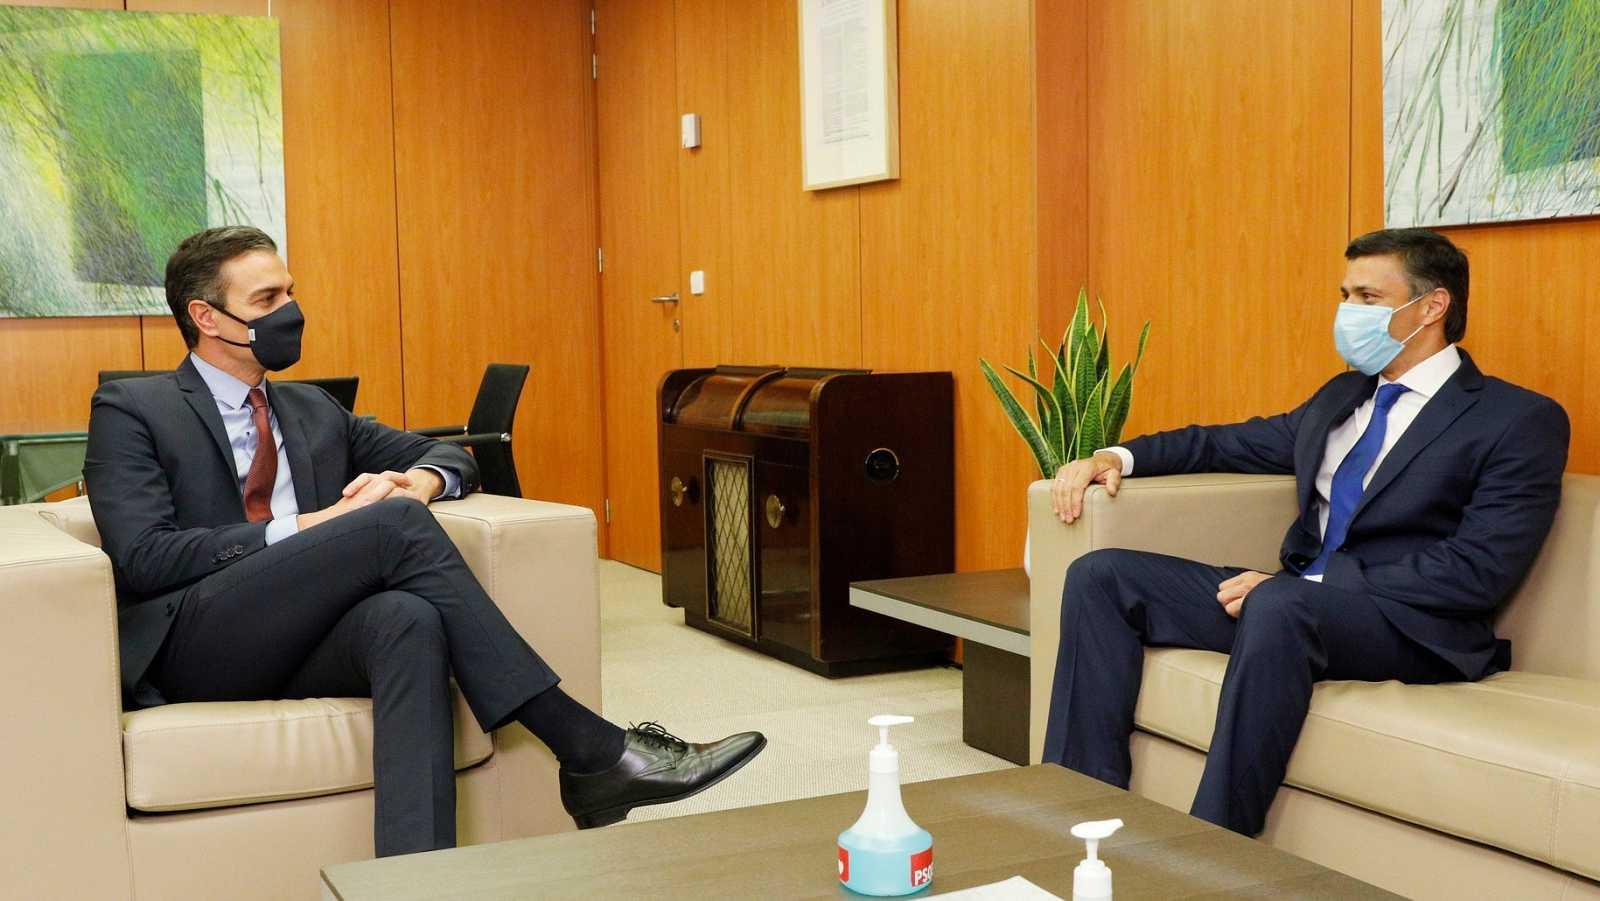 Pedro Sánchez y Leopoldo López se reúnen en Ferraz